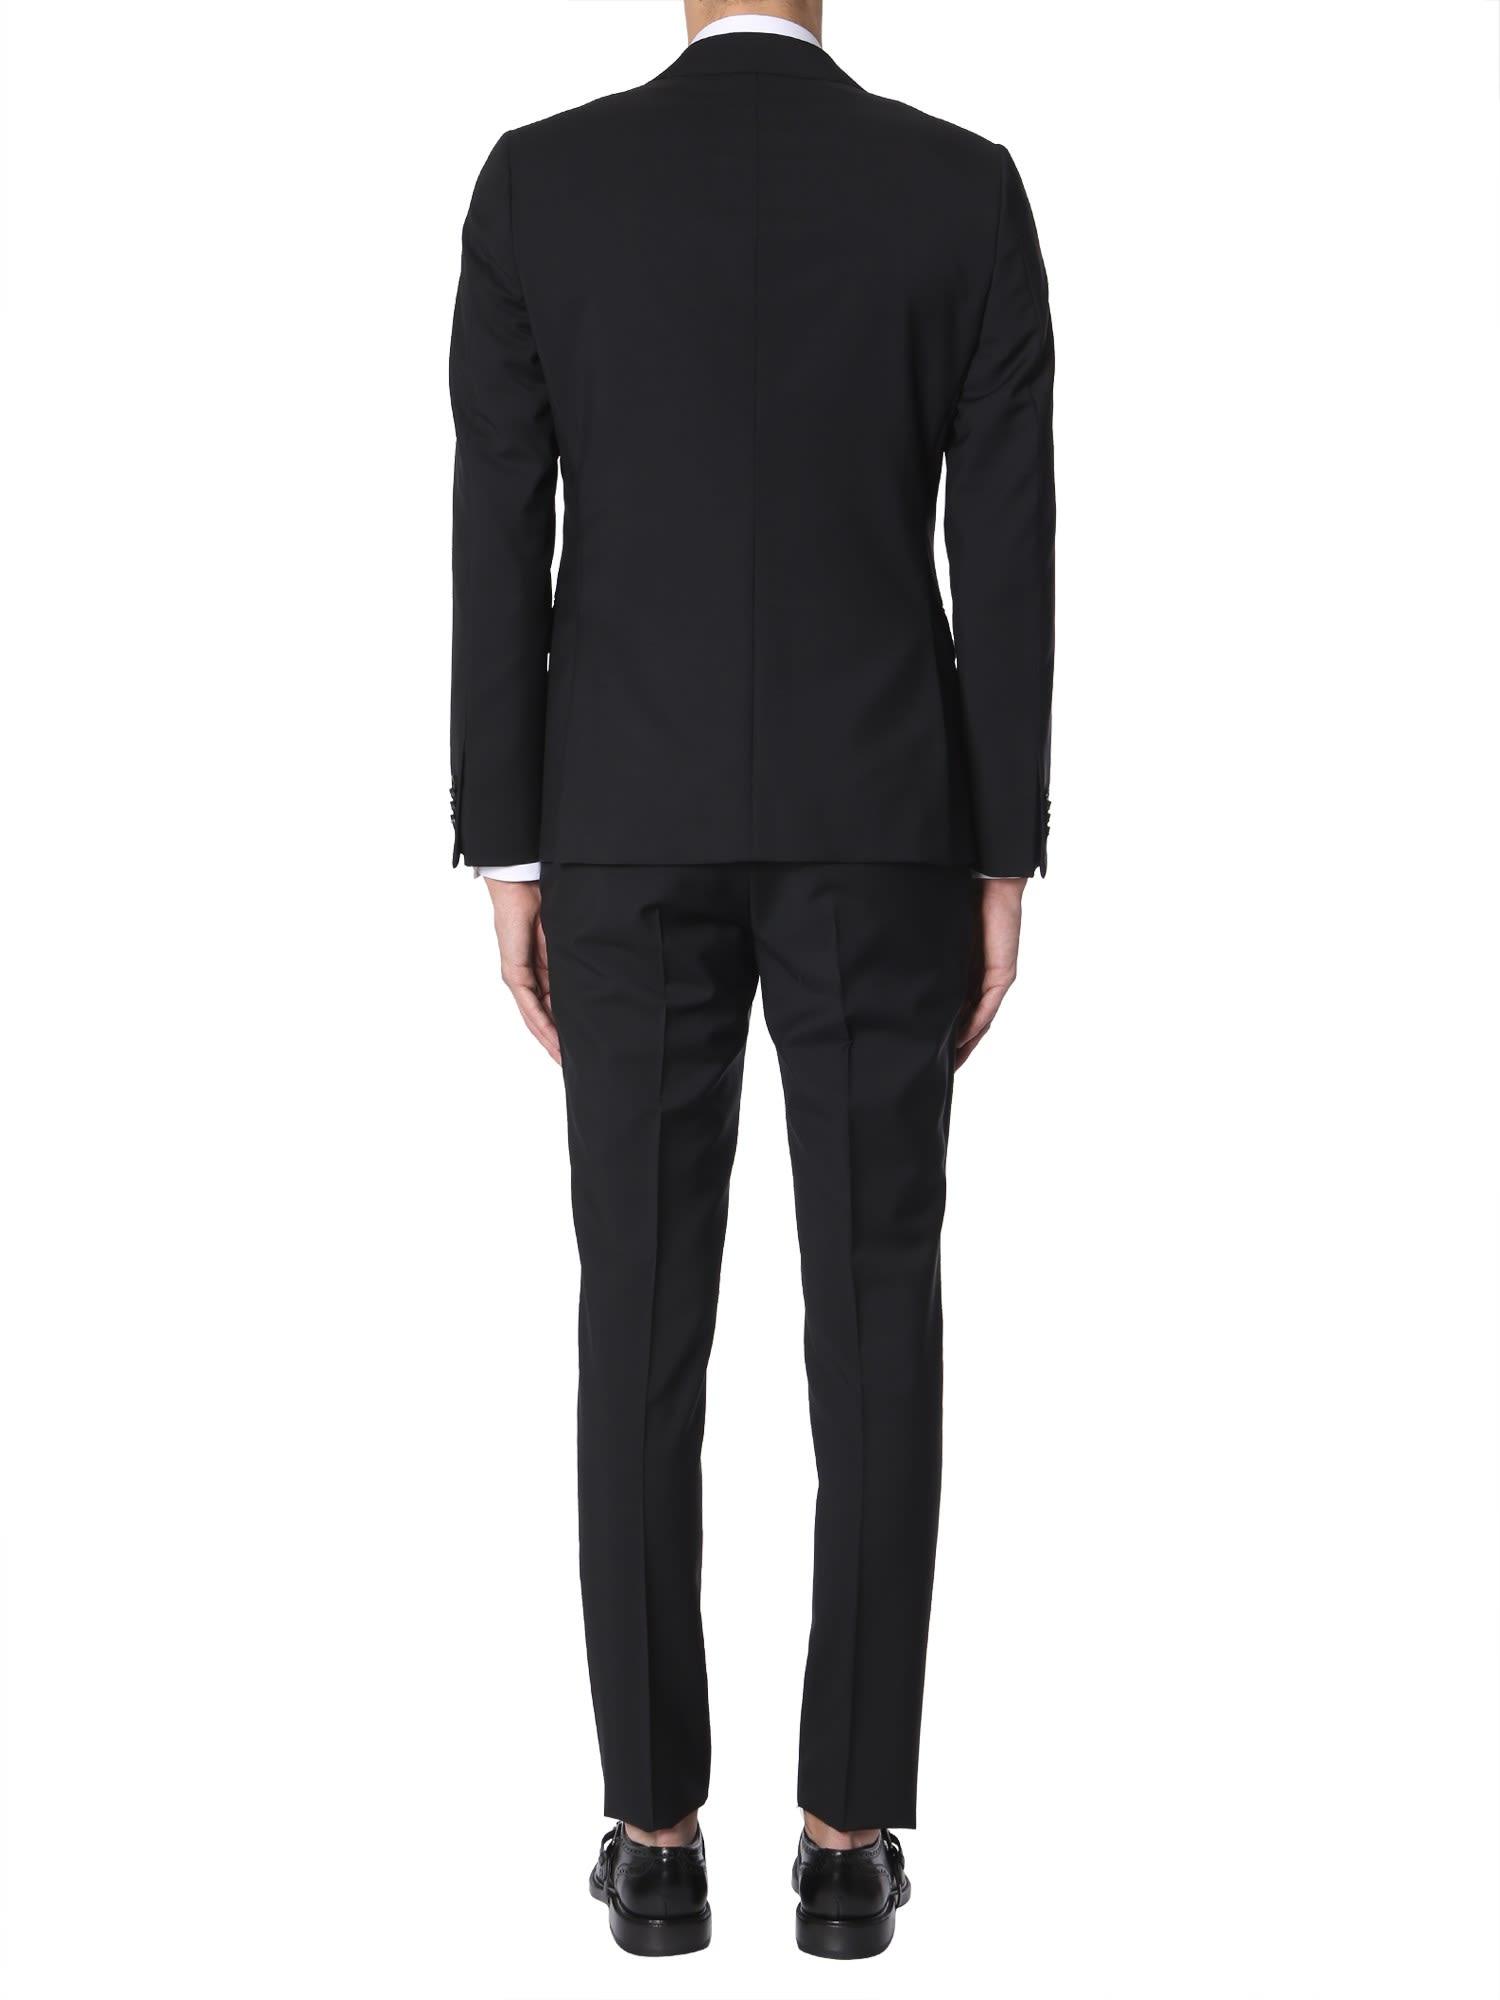 the best order online new varieties Z Zegna Z Zegna Complete Slim Fit Two-piece Suit - NERO ...